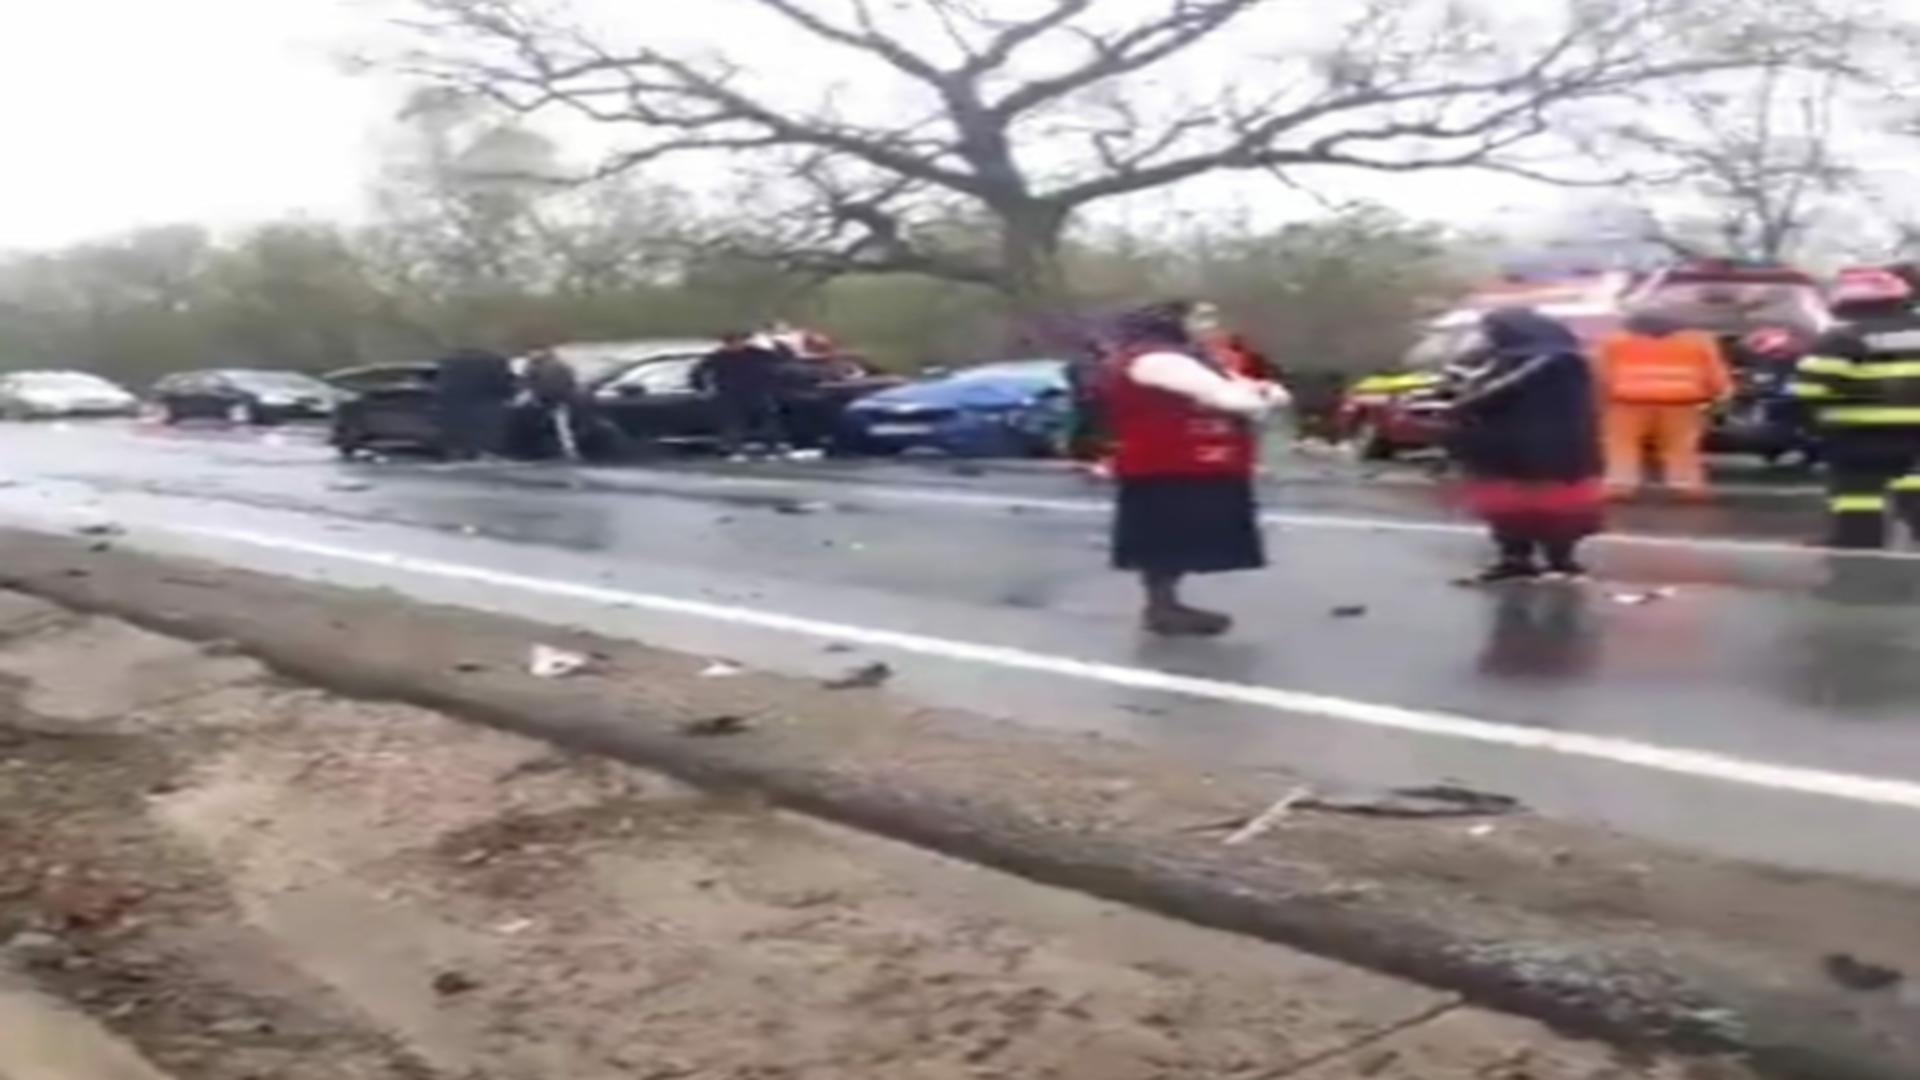 Accident DN 24 Tecuci- Bârlad (DE 581)